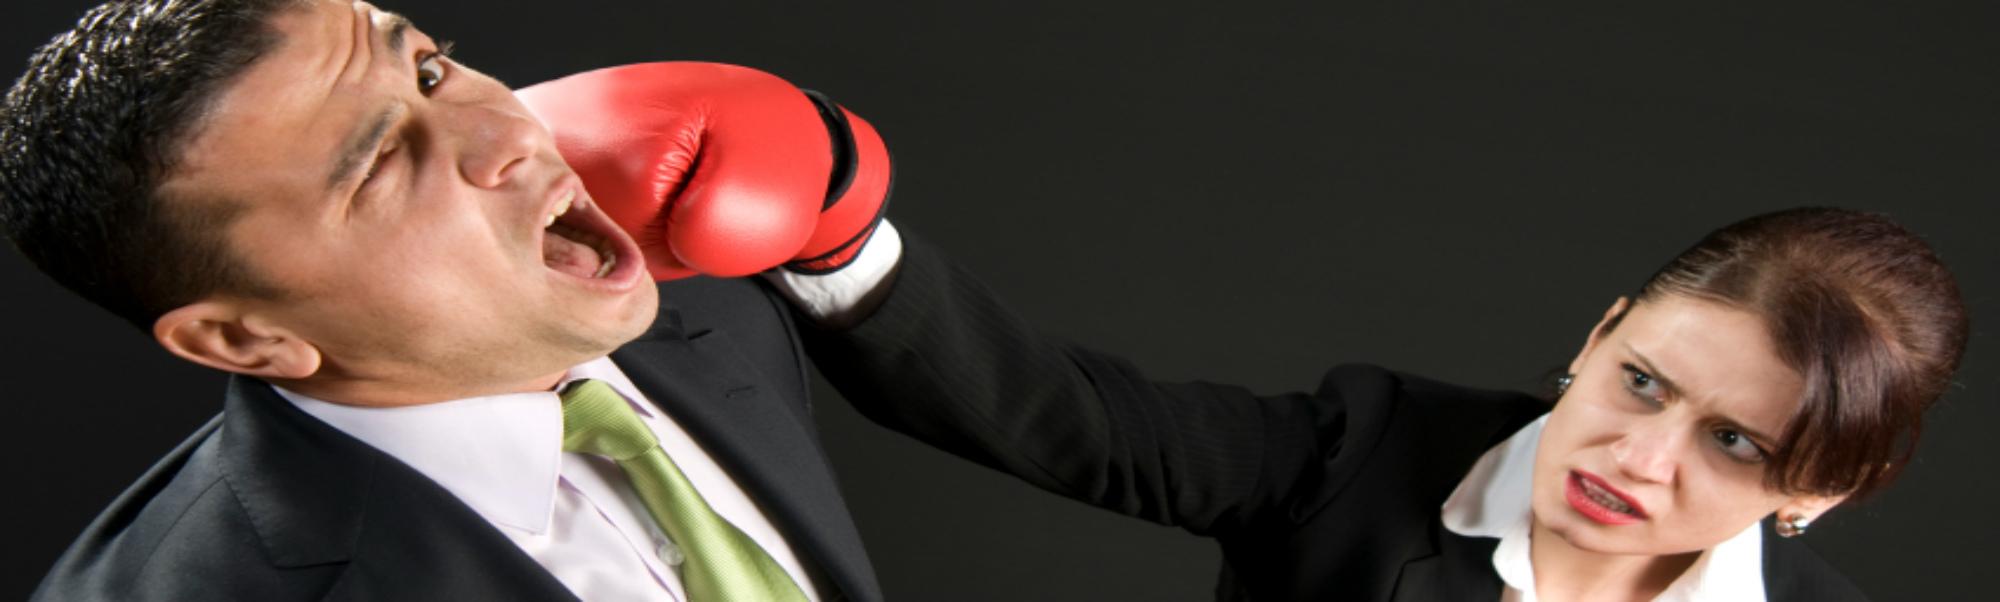 "Hiring an Aggressive Divorce Attorney: Can I ""Win"" My Divorce?"